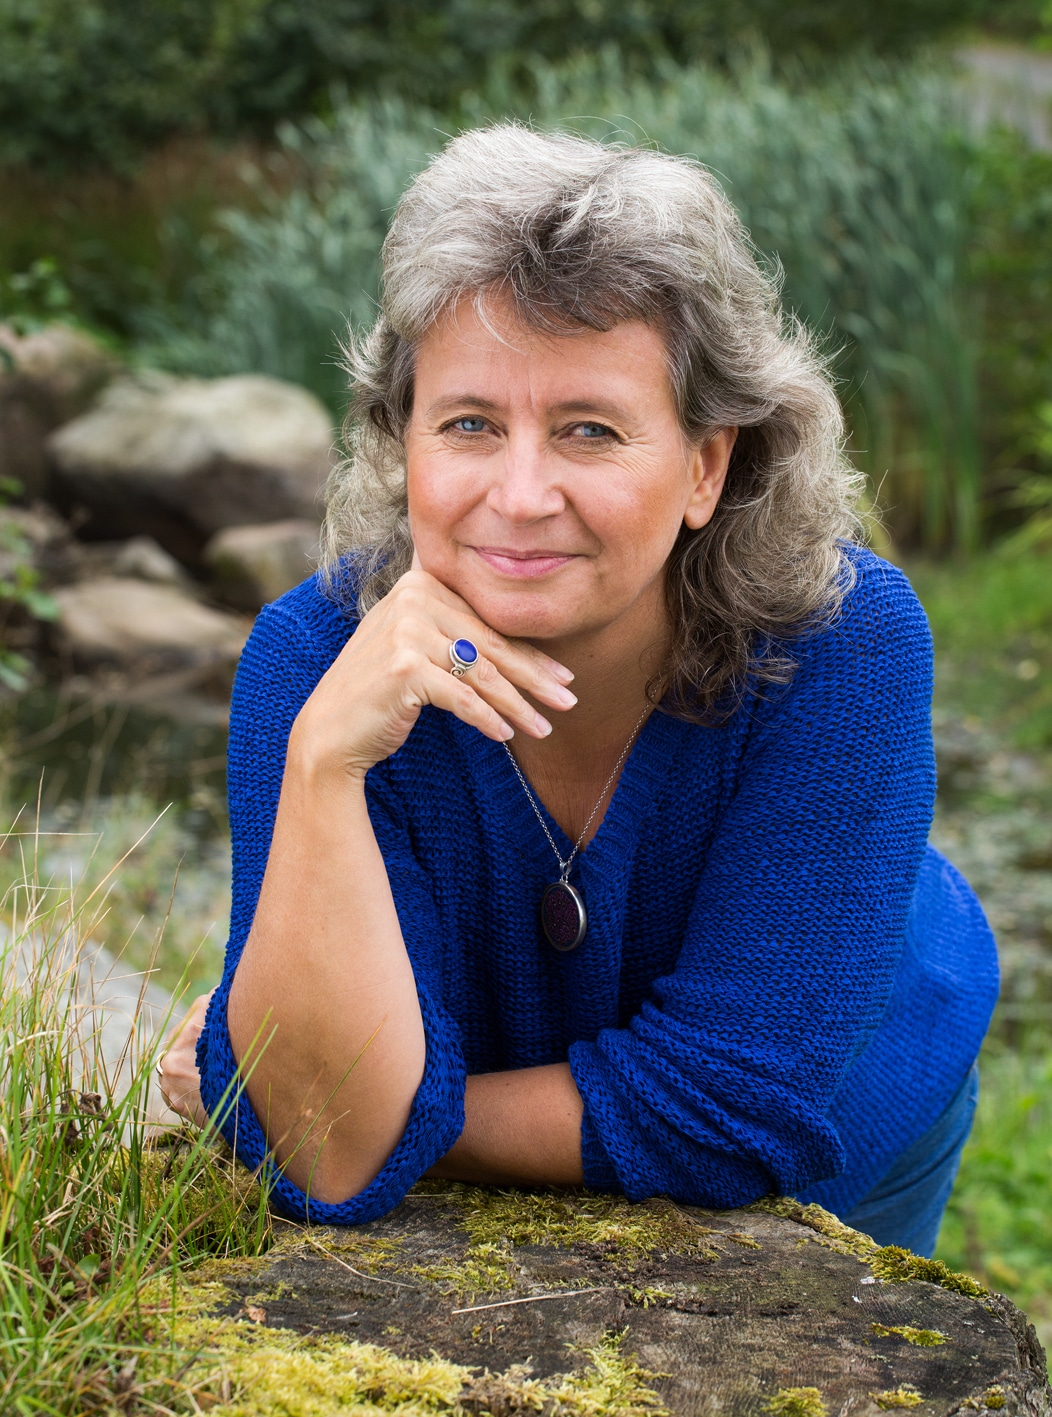 Livekurs med Susanne Jönsson